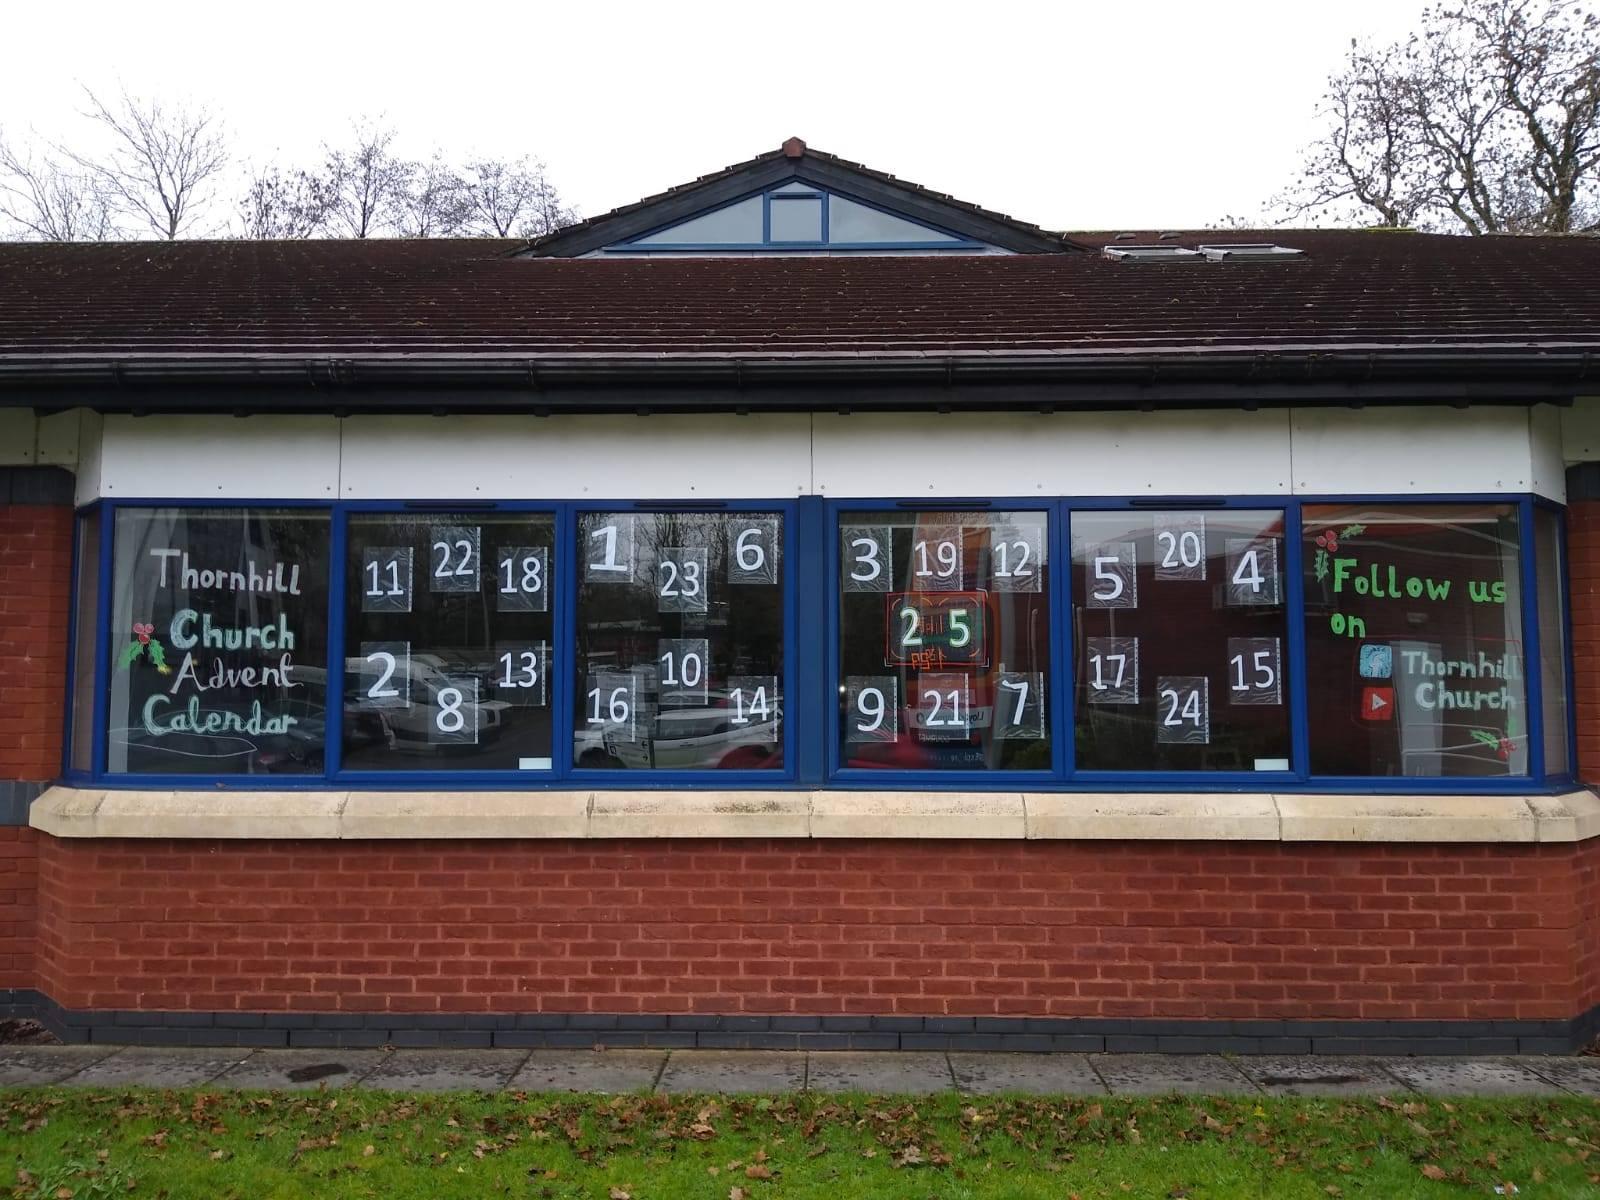 The biggest advent calendar in Thornhill?